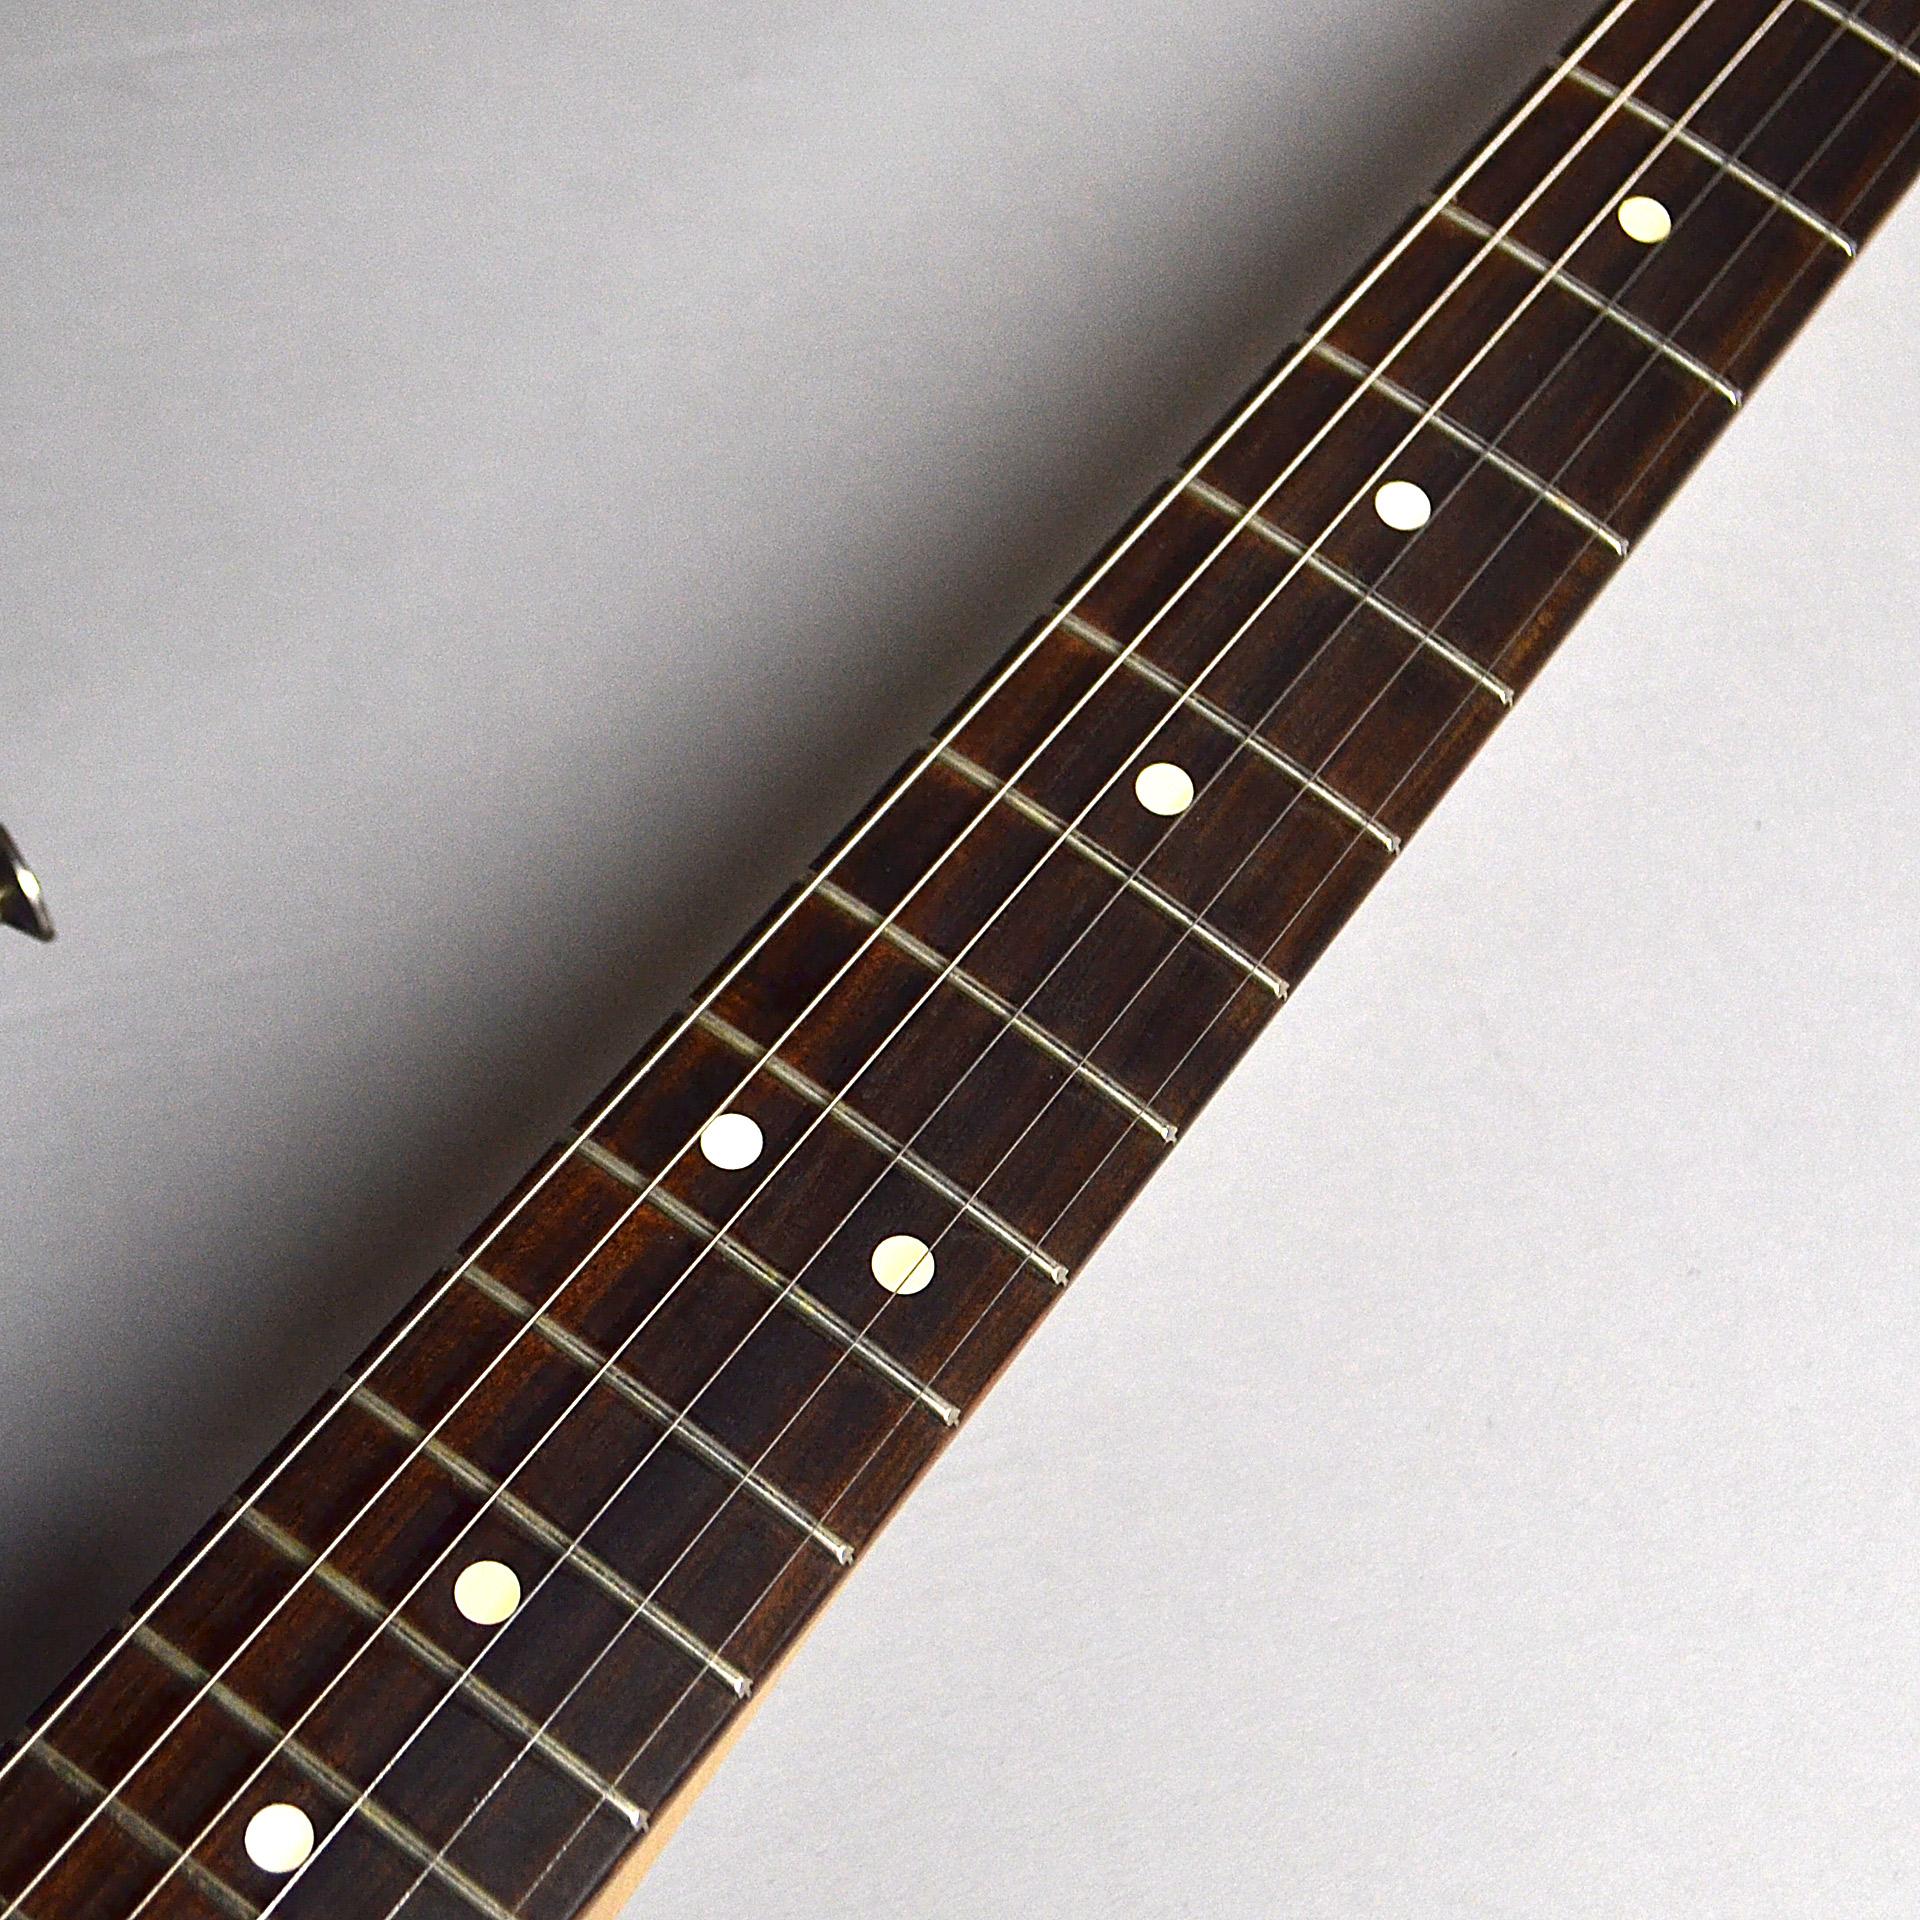 MEX standard stratocasterの全体画像(縦)